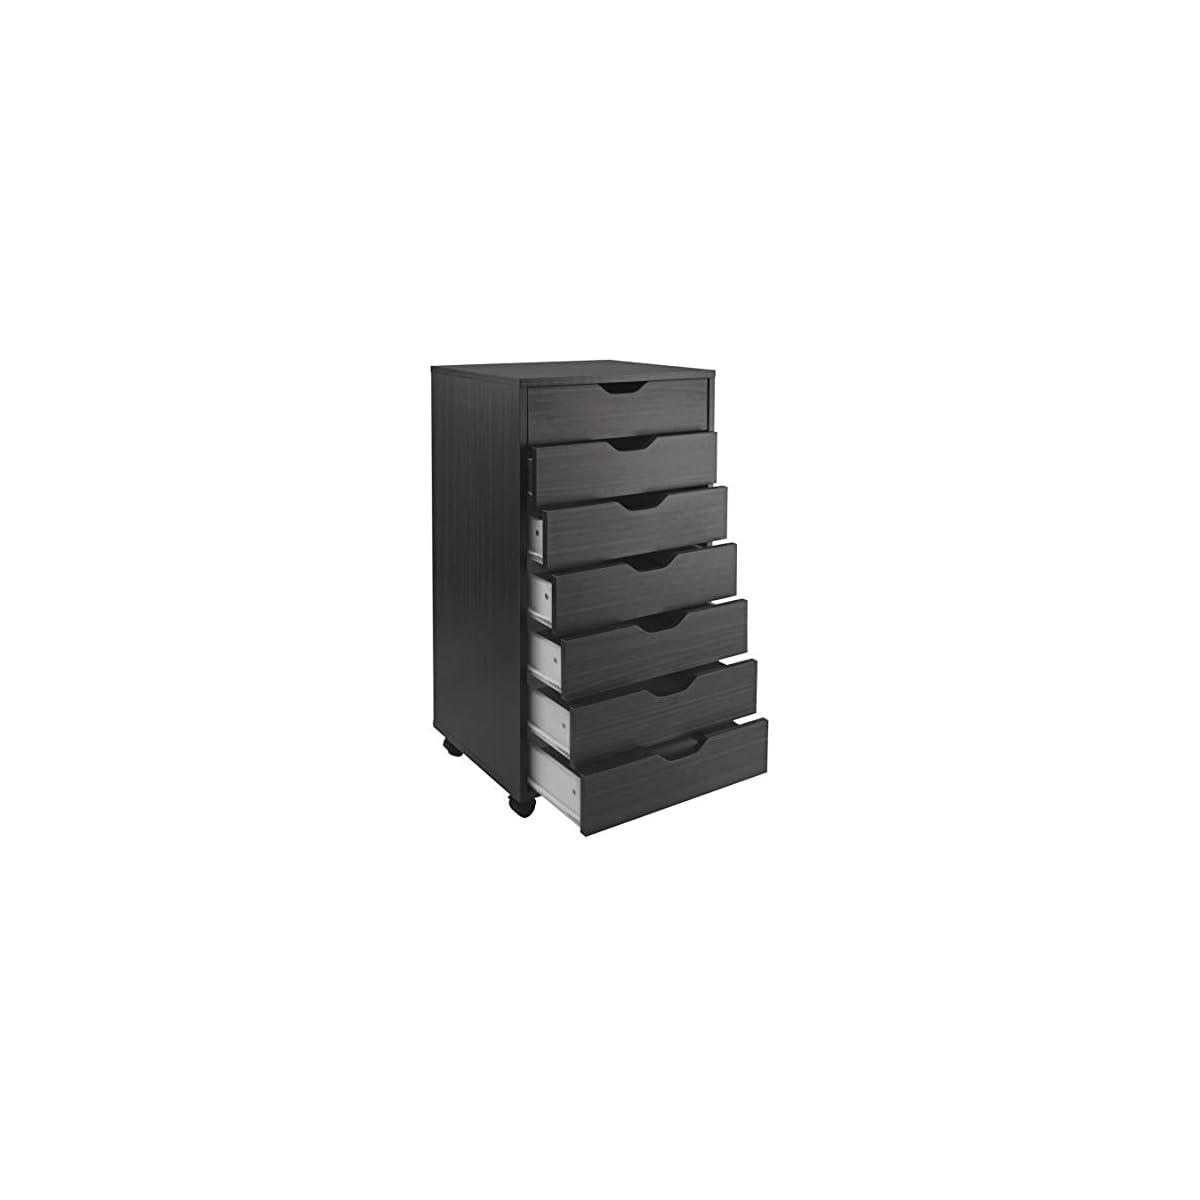 Winsome Halifax storage/organization